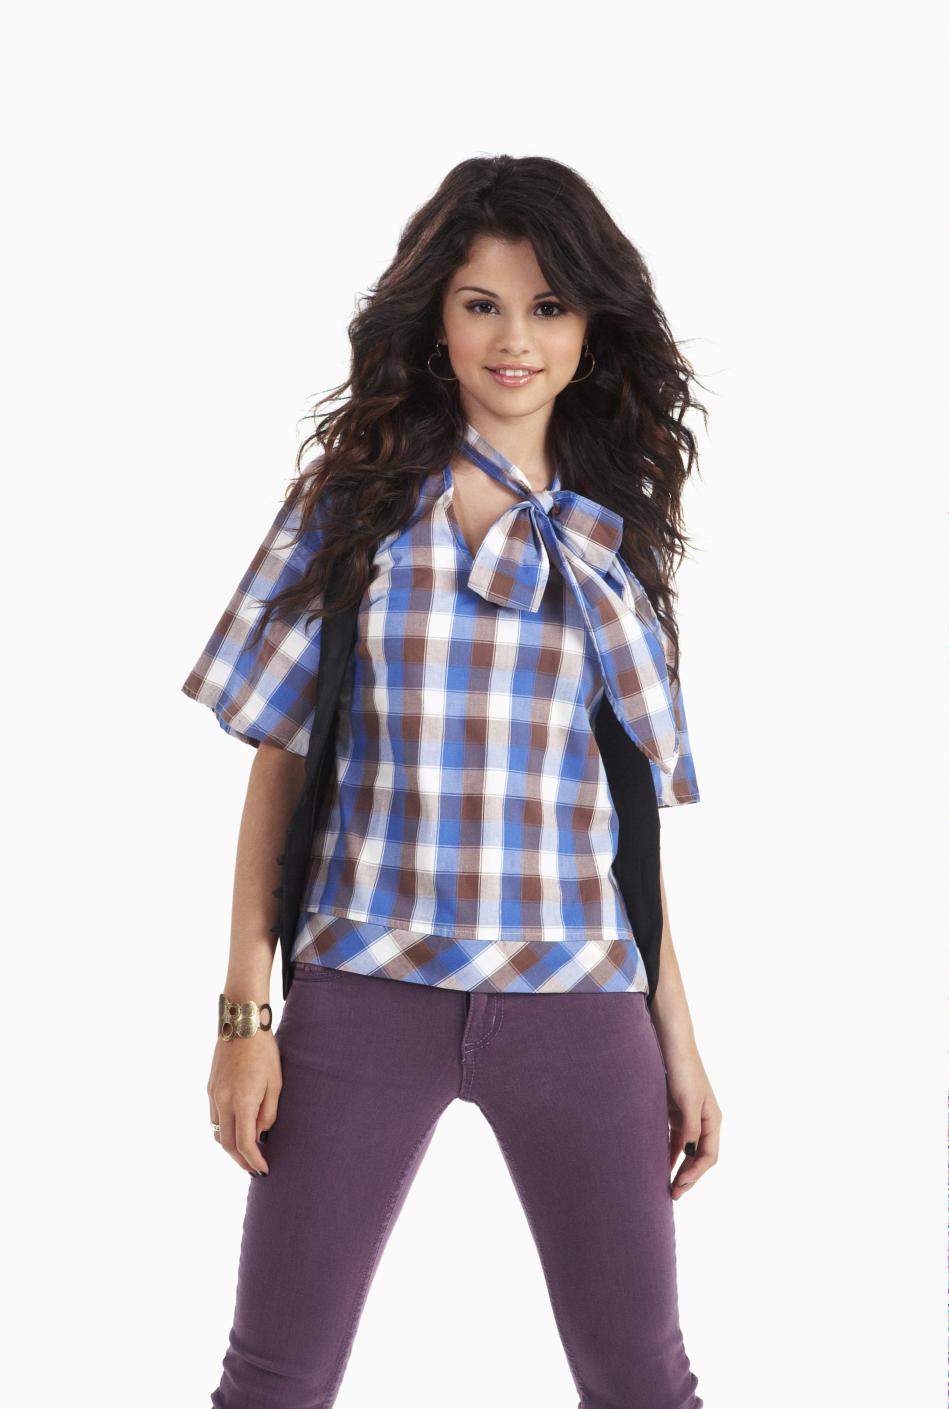 Selena Gomez Richard Shoot 31 | Selena Gomez World.com